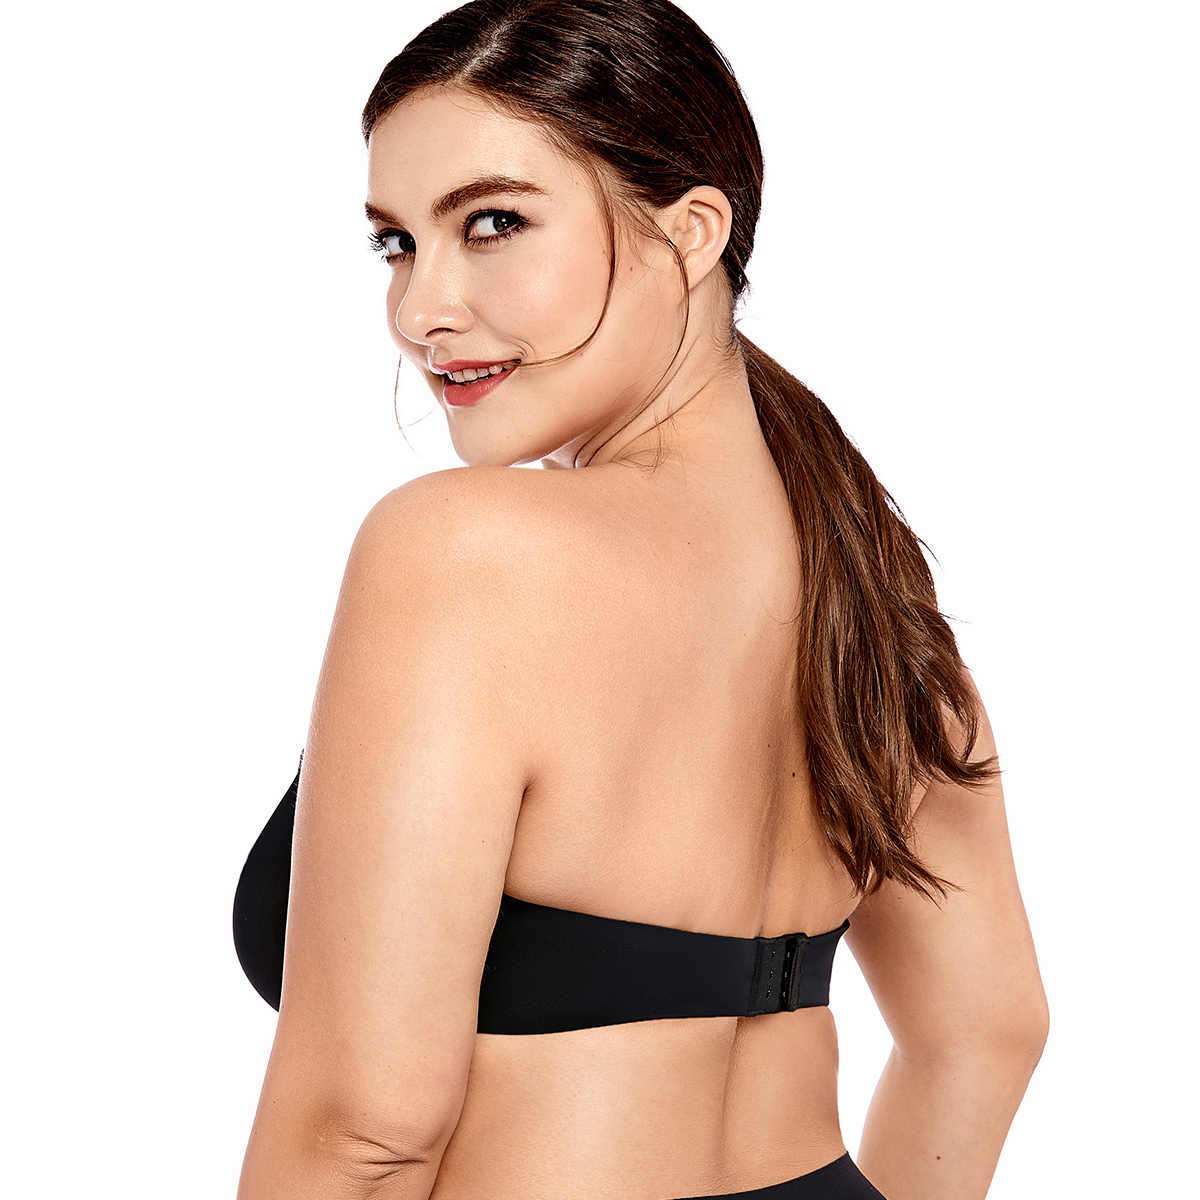 cf2b257ef28 ... Delimira Women s Full Coverage Smooth Seamless Invisible Underwire  Minimizer Strapless Bra Plus ...